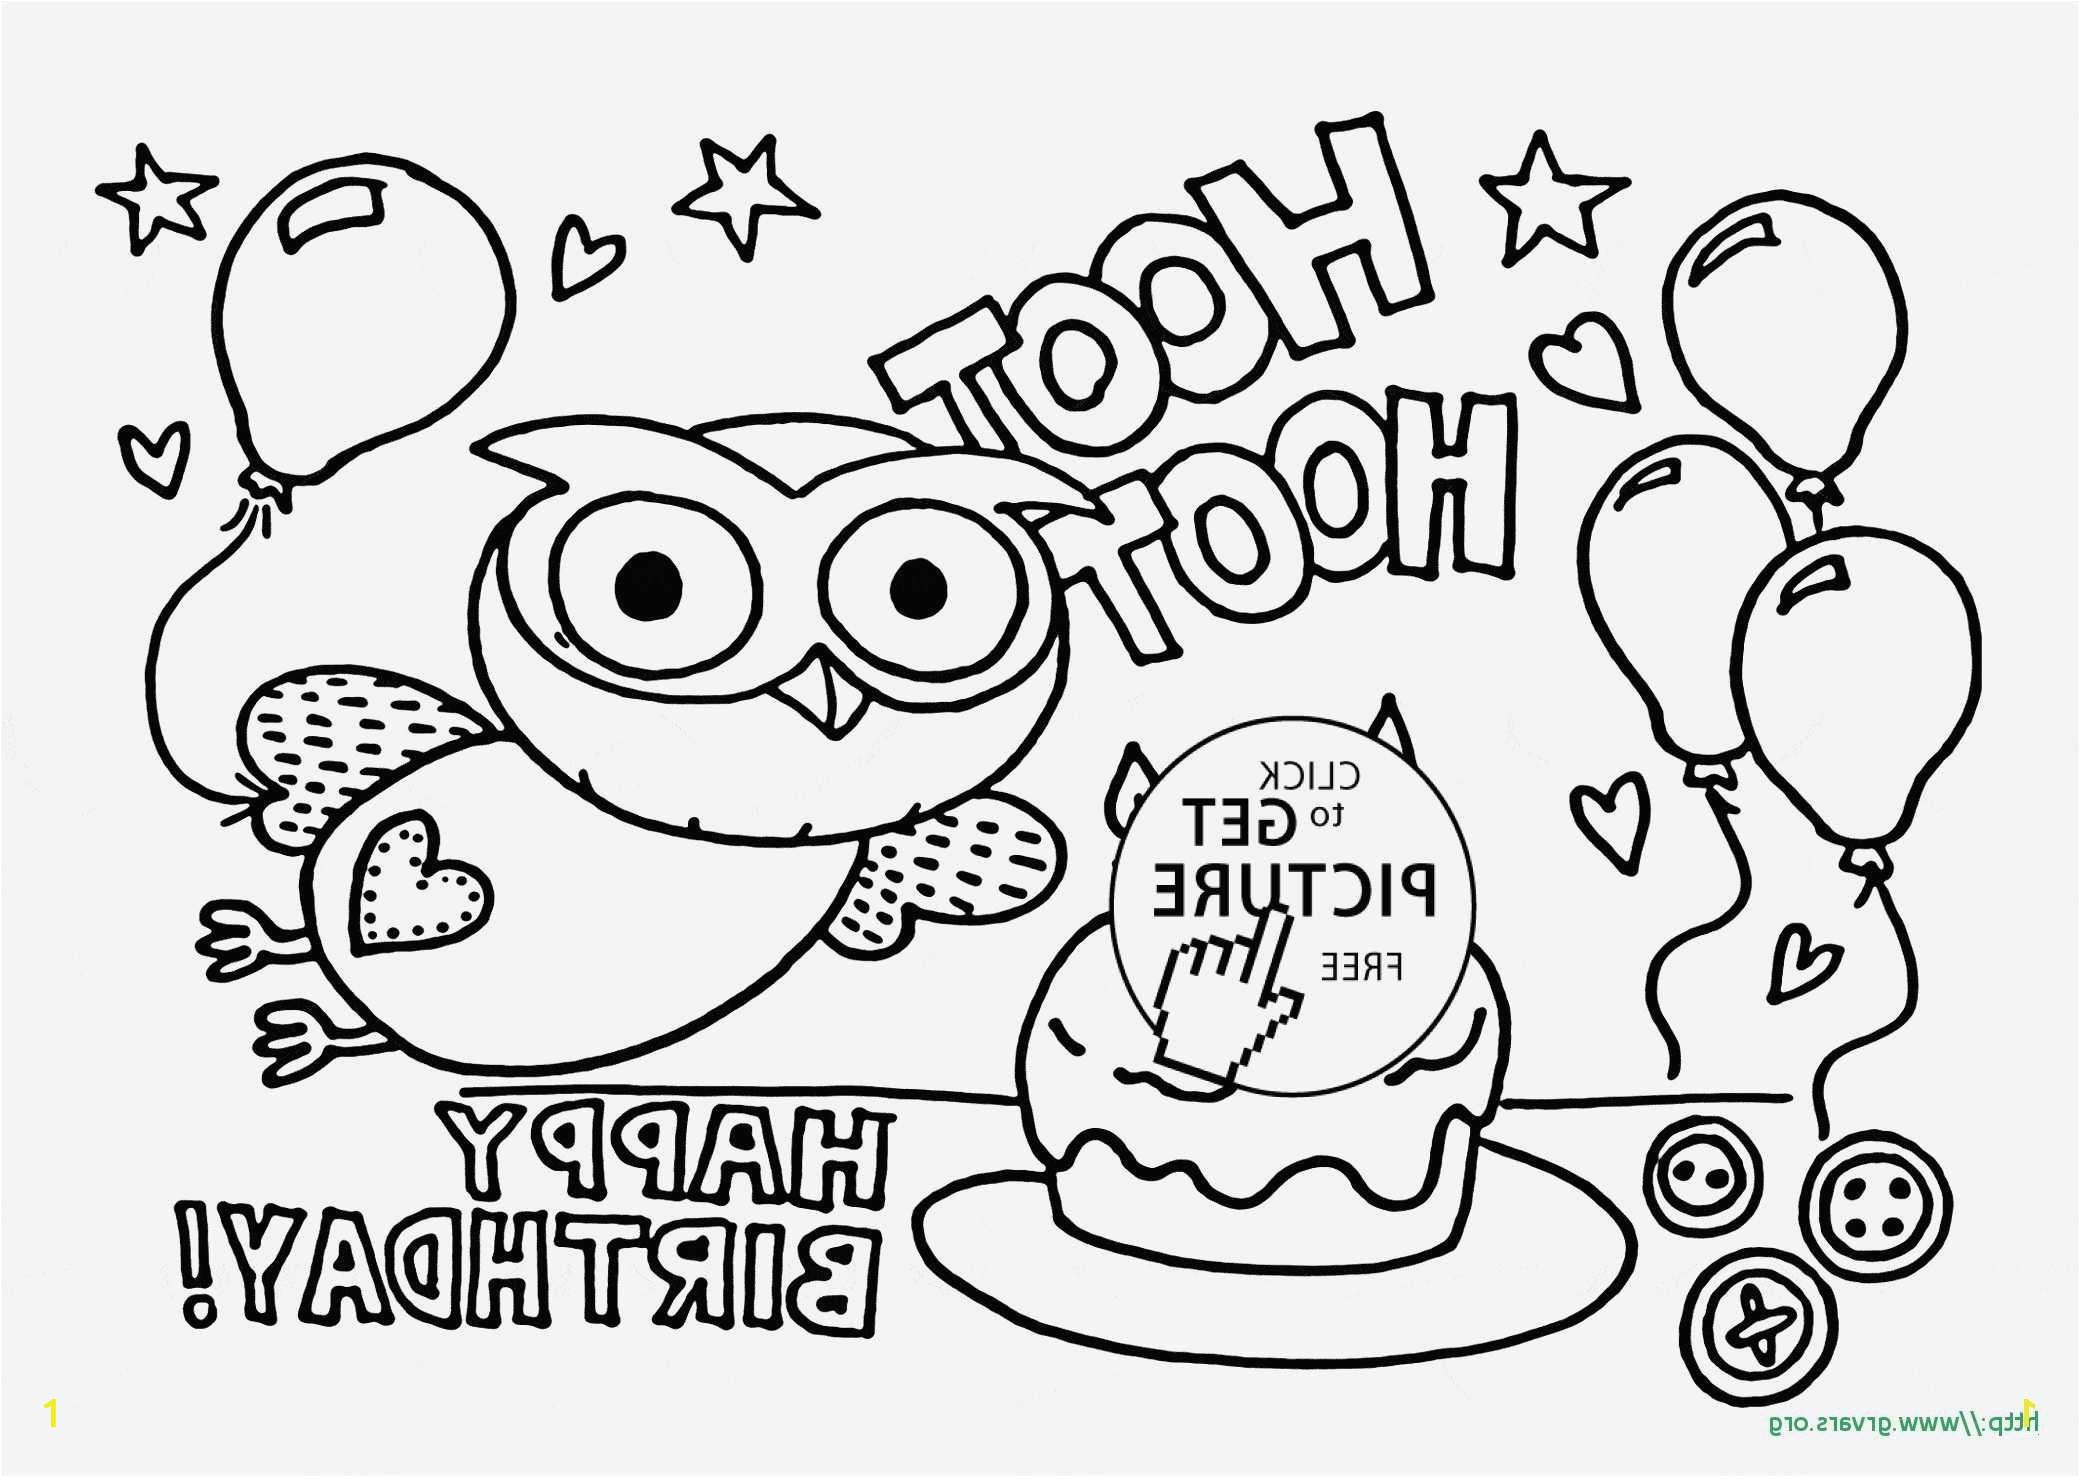 free cupcake coloring page cool stock beautiful birthday cake coloring sheet nocn of free cupcake coloring page